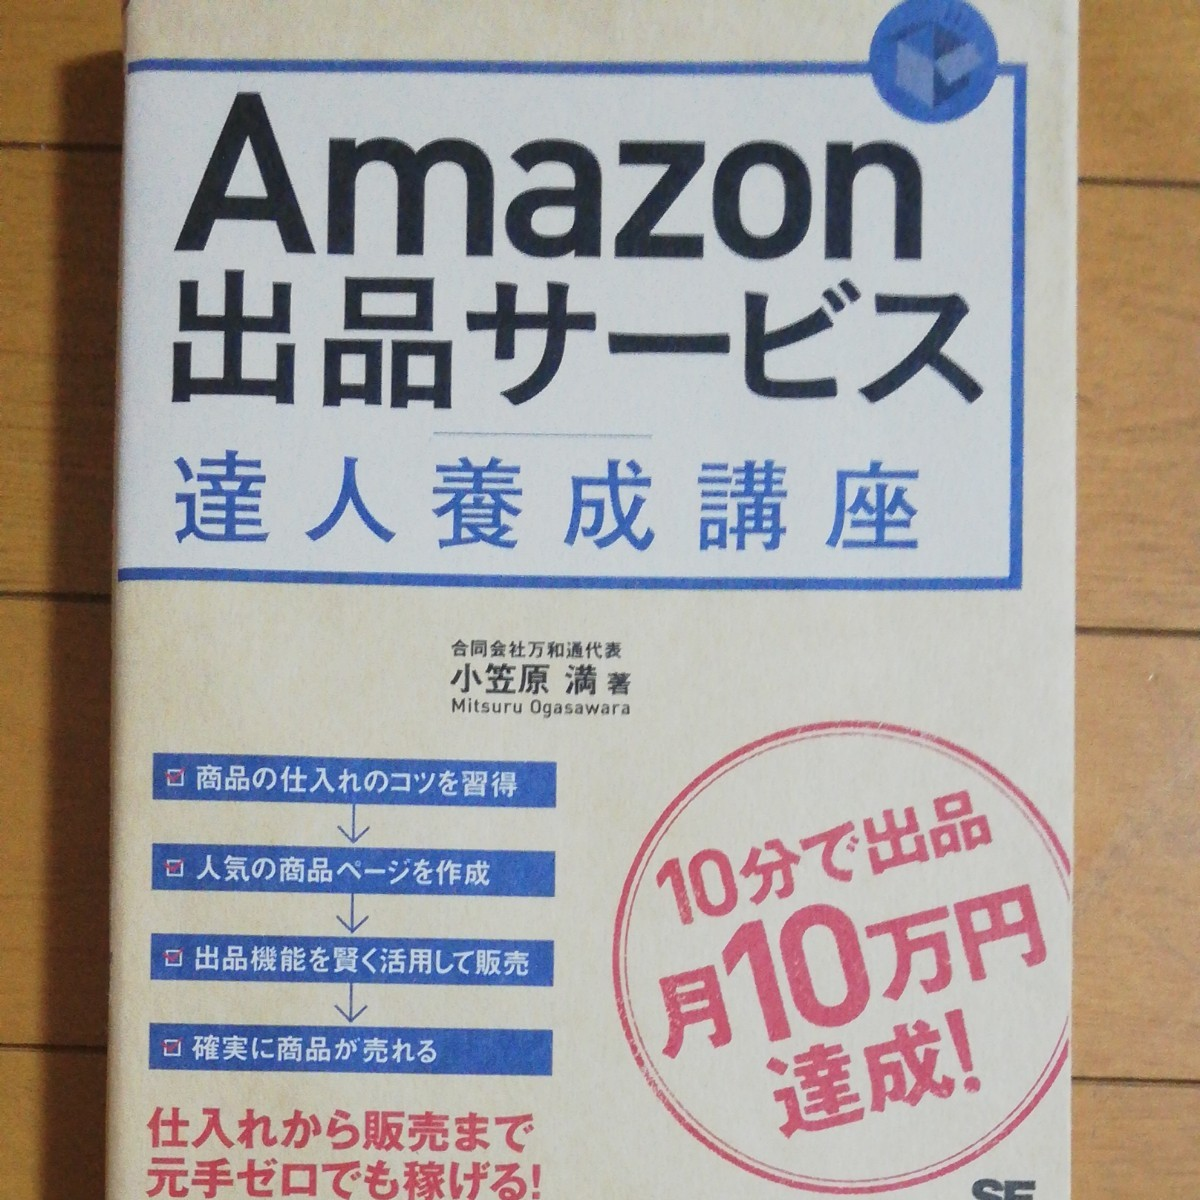 Amazon出品サ-ビス達人養成講座 10分で出品月10万円達成!